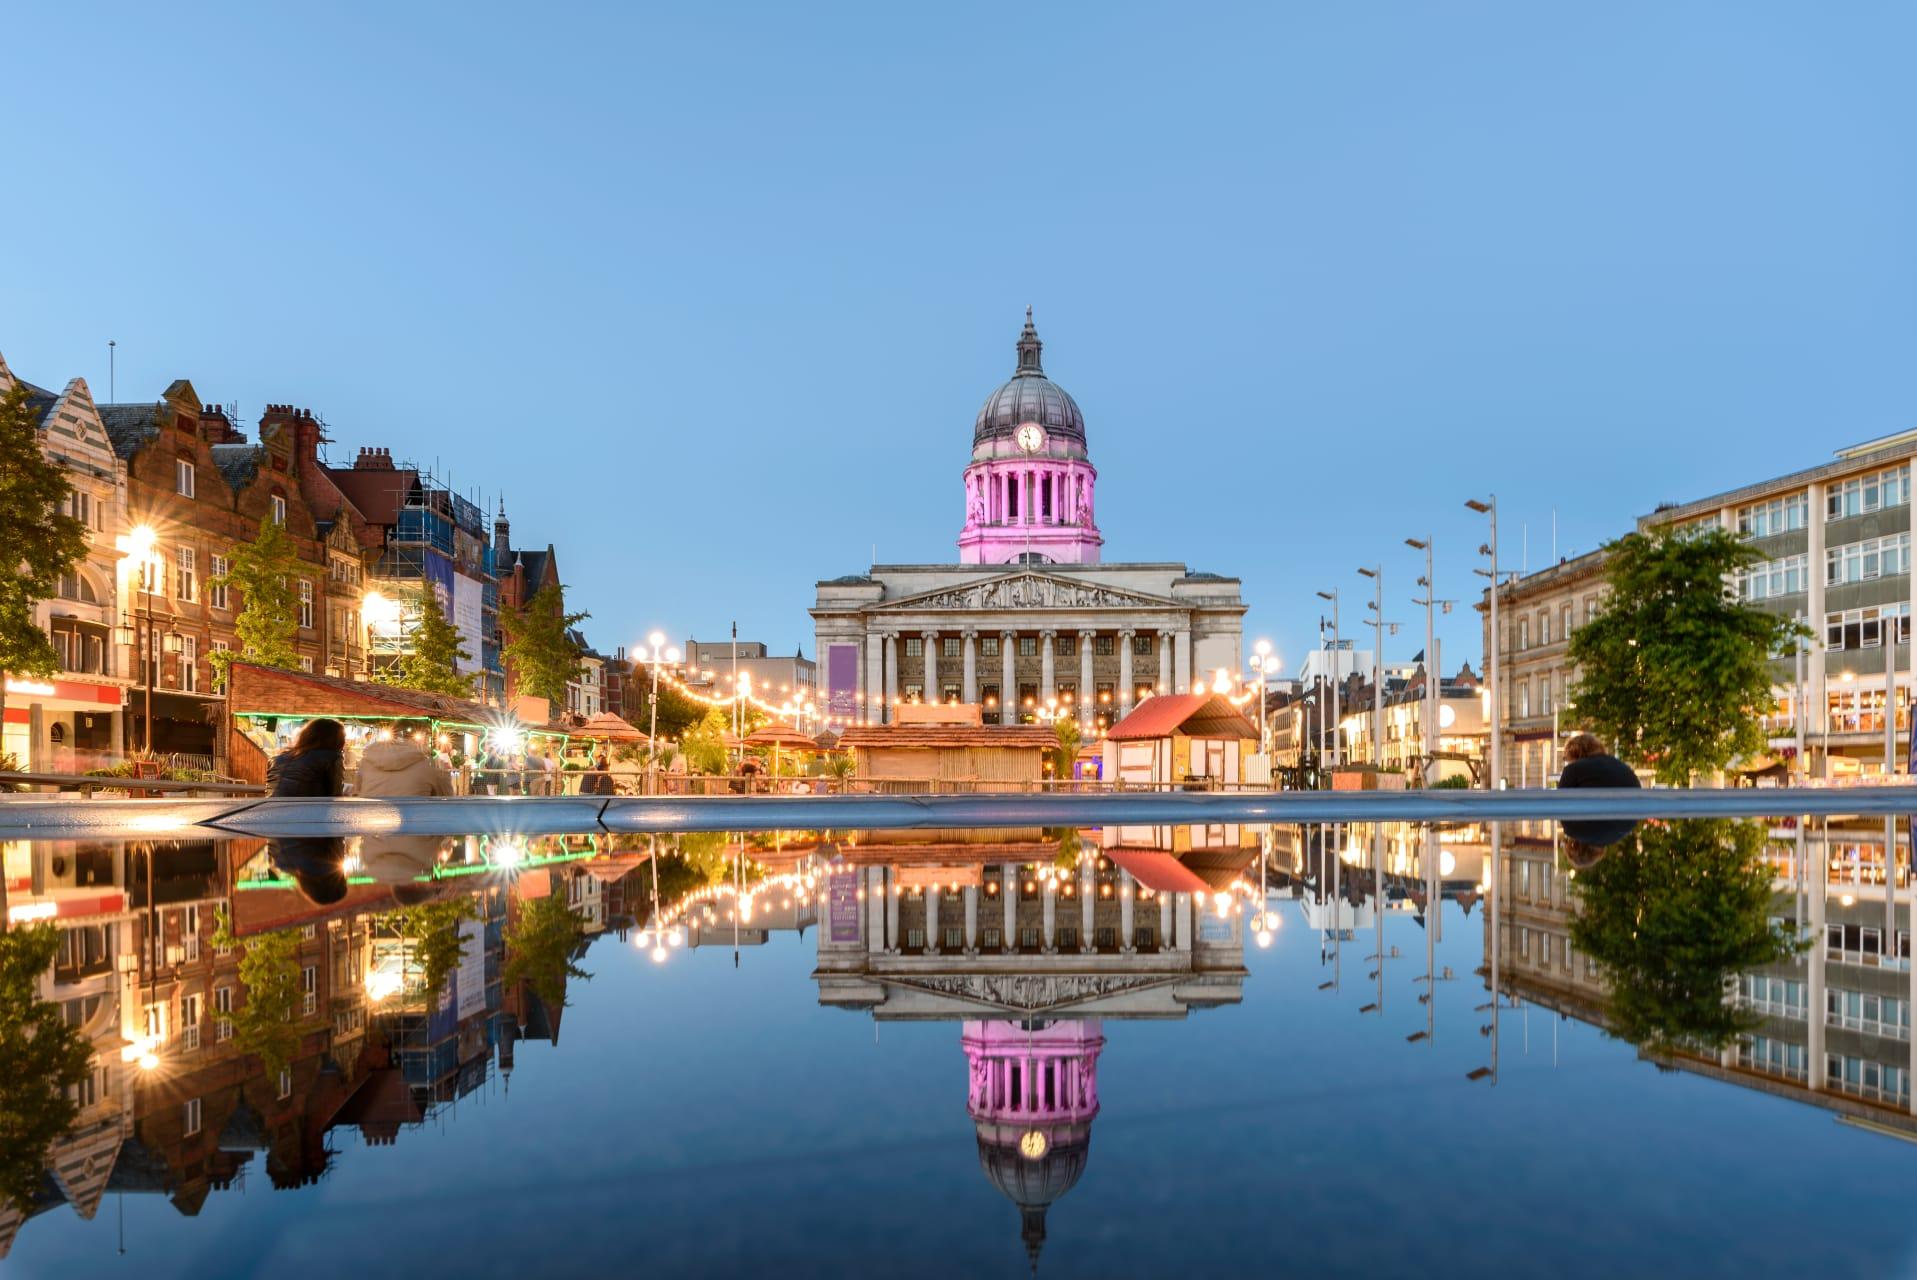 Nottingham cover image